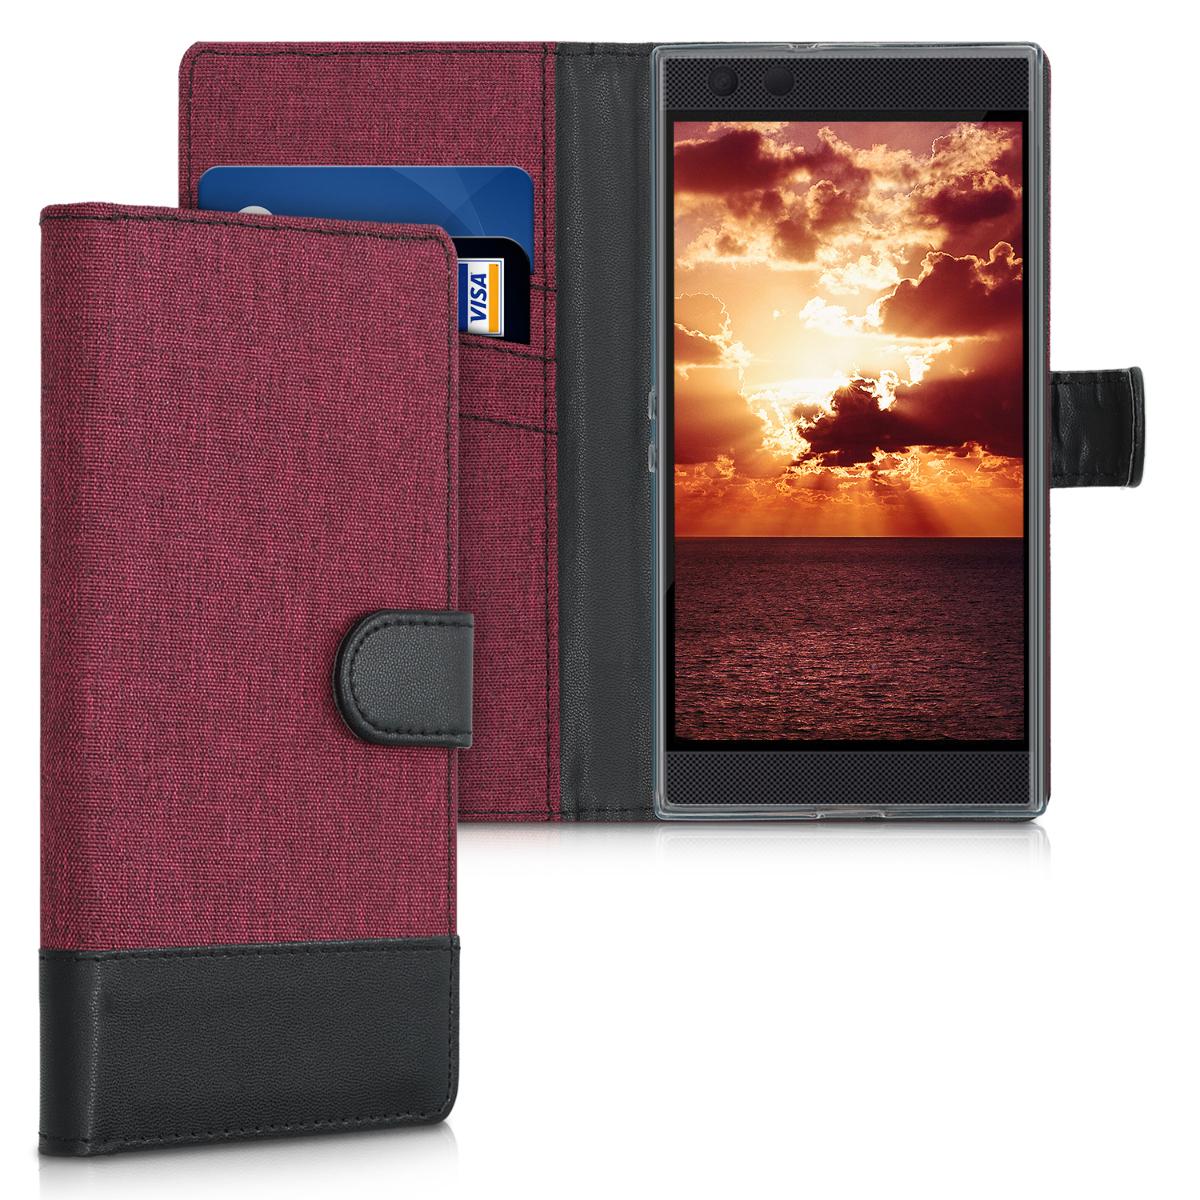 KW Θήκη Πορτοφόλι Razer Phone 2 - Dark Red Canvas / Black (46788.04)